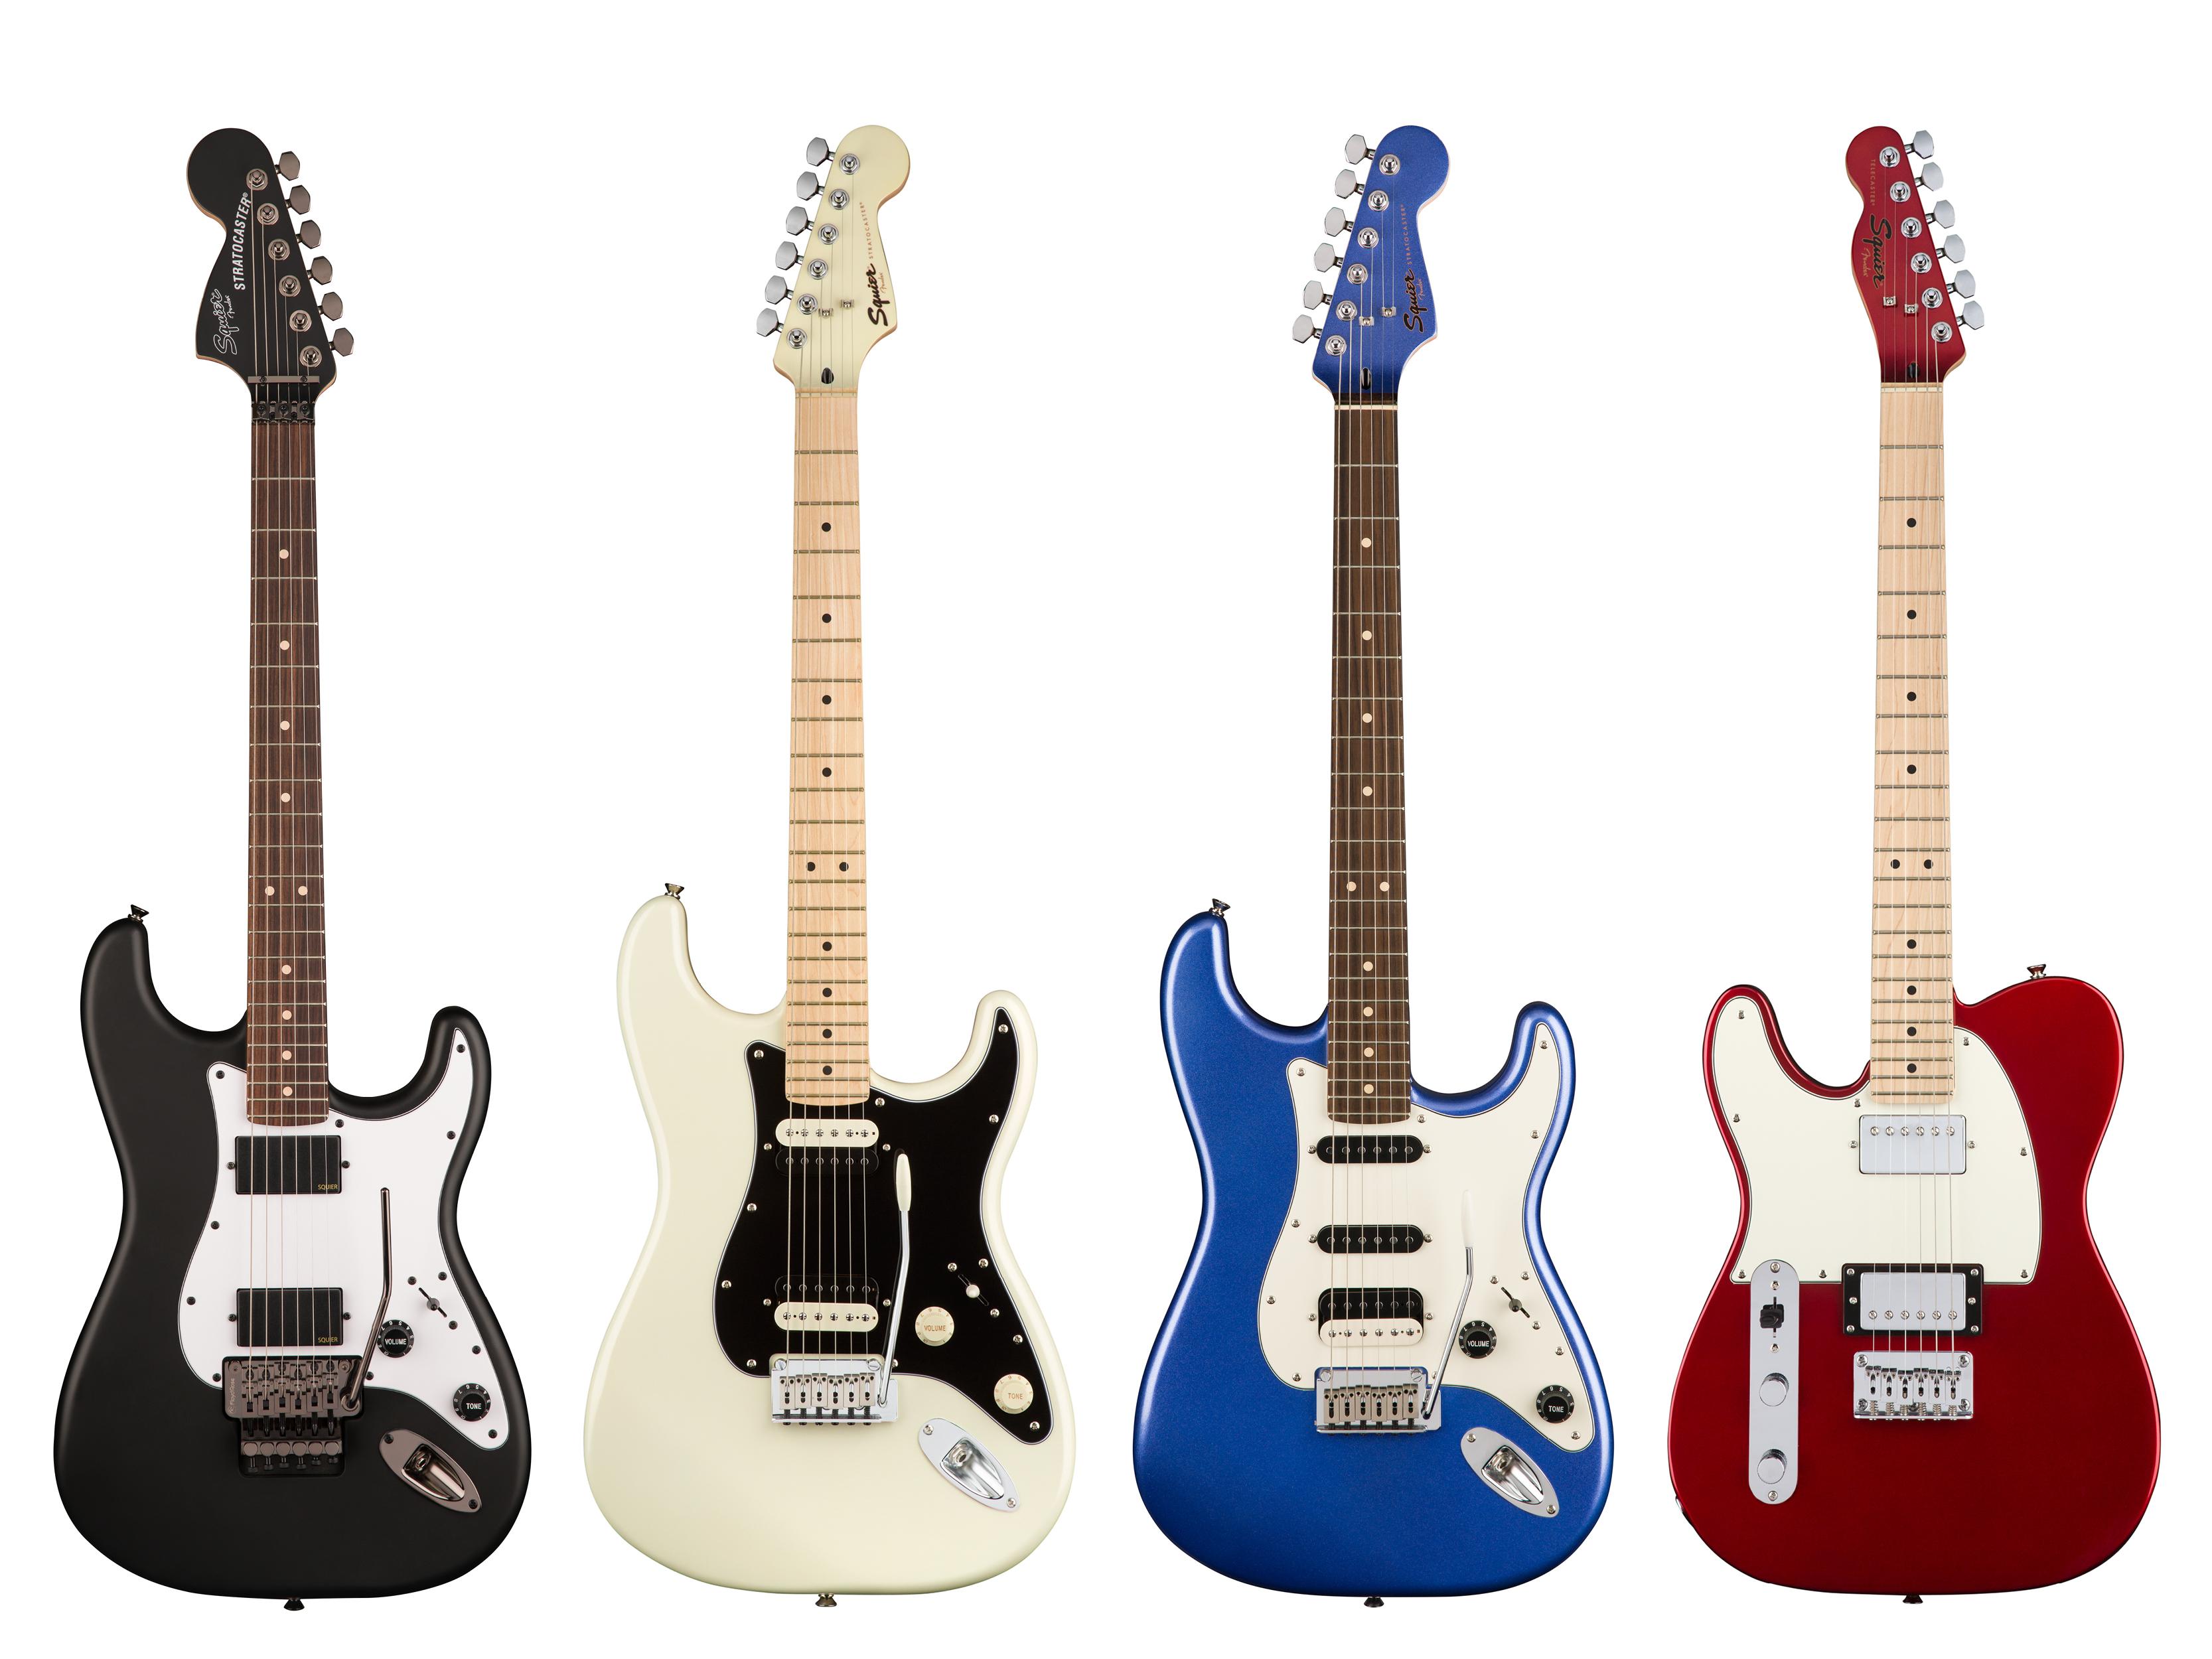 squier dives into 2018 with new guitar line up guitar com all